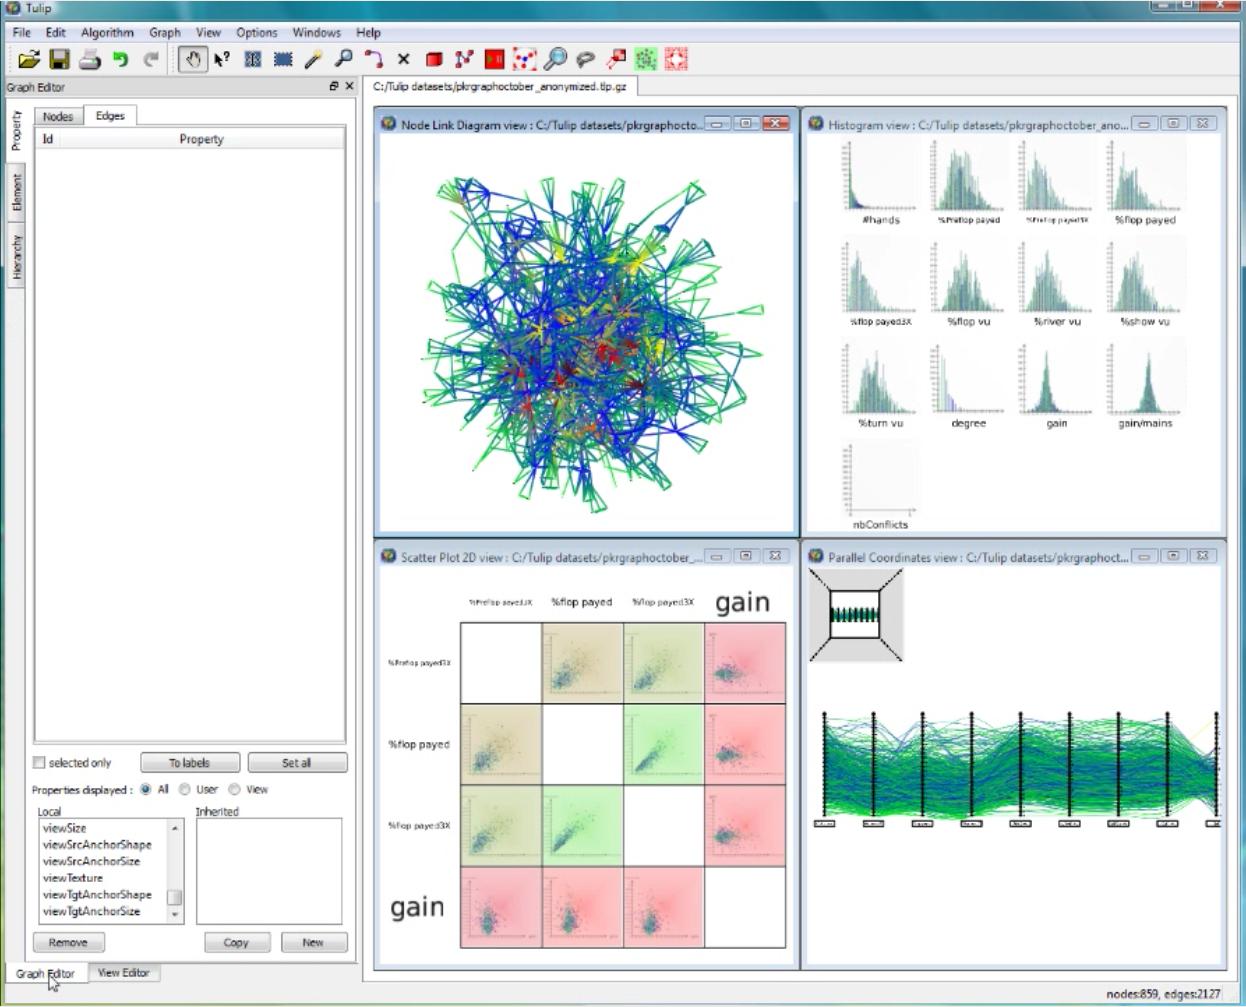 Visual Analytics with Tulip part 1 (video)